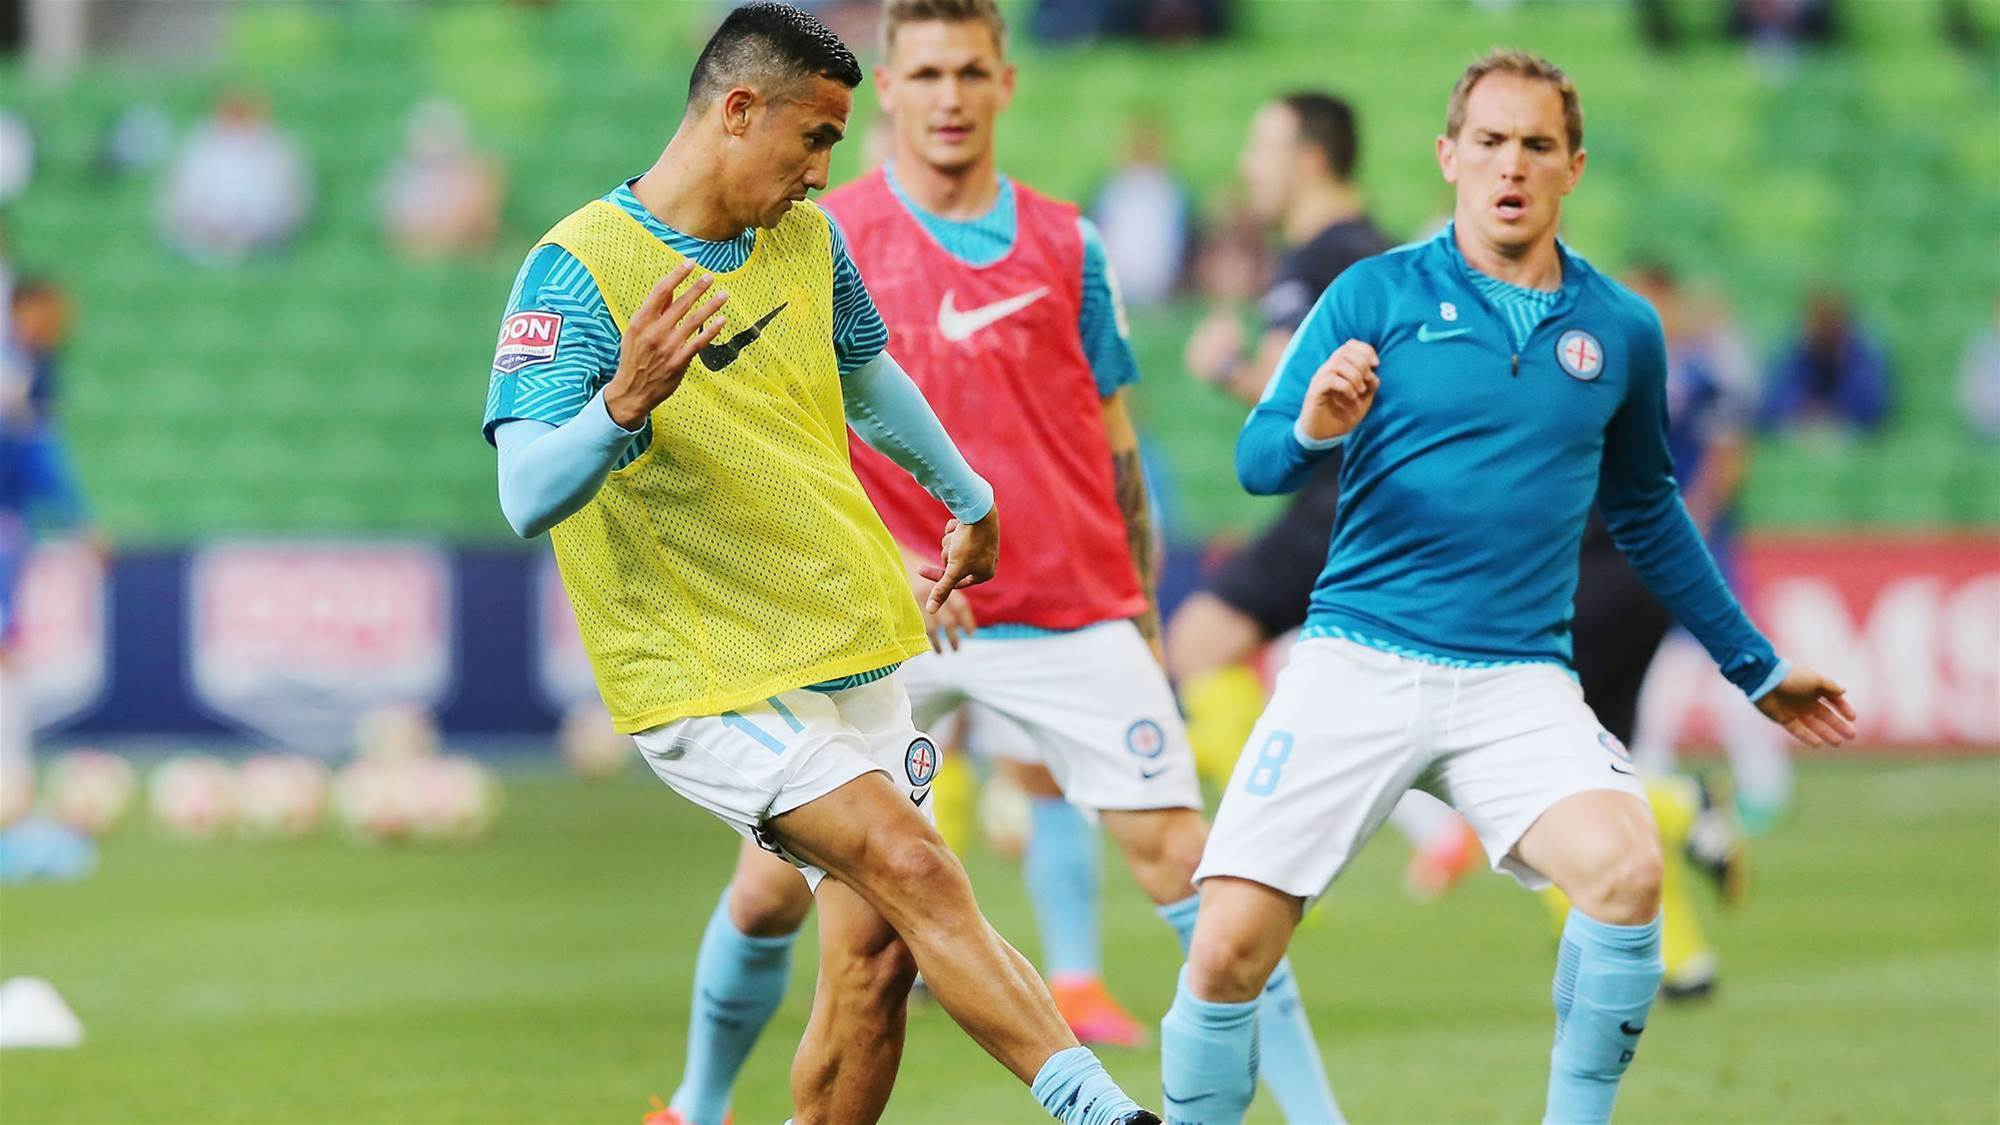 Cahill's message for City Socceroo hopefuls